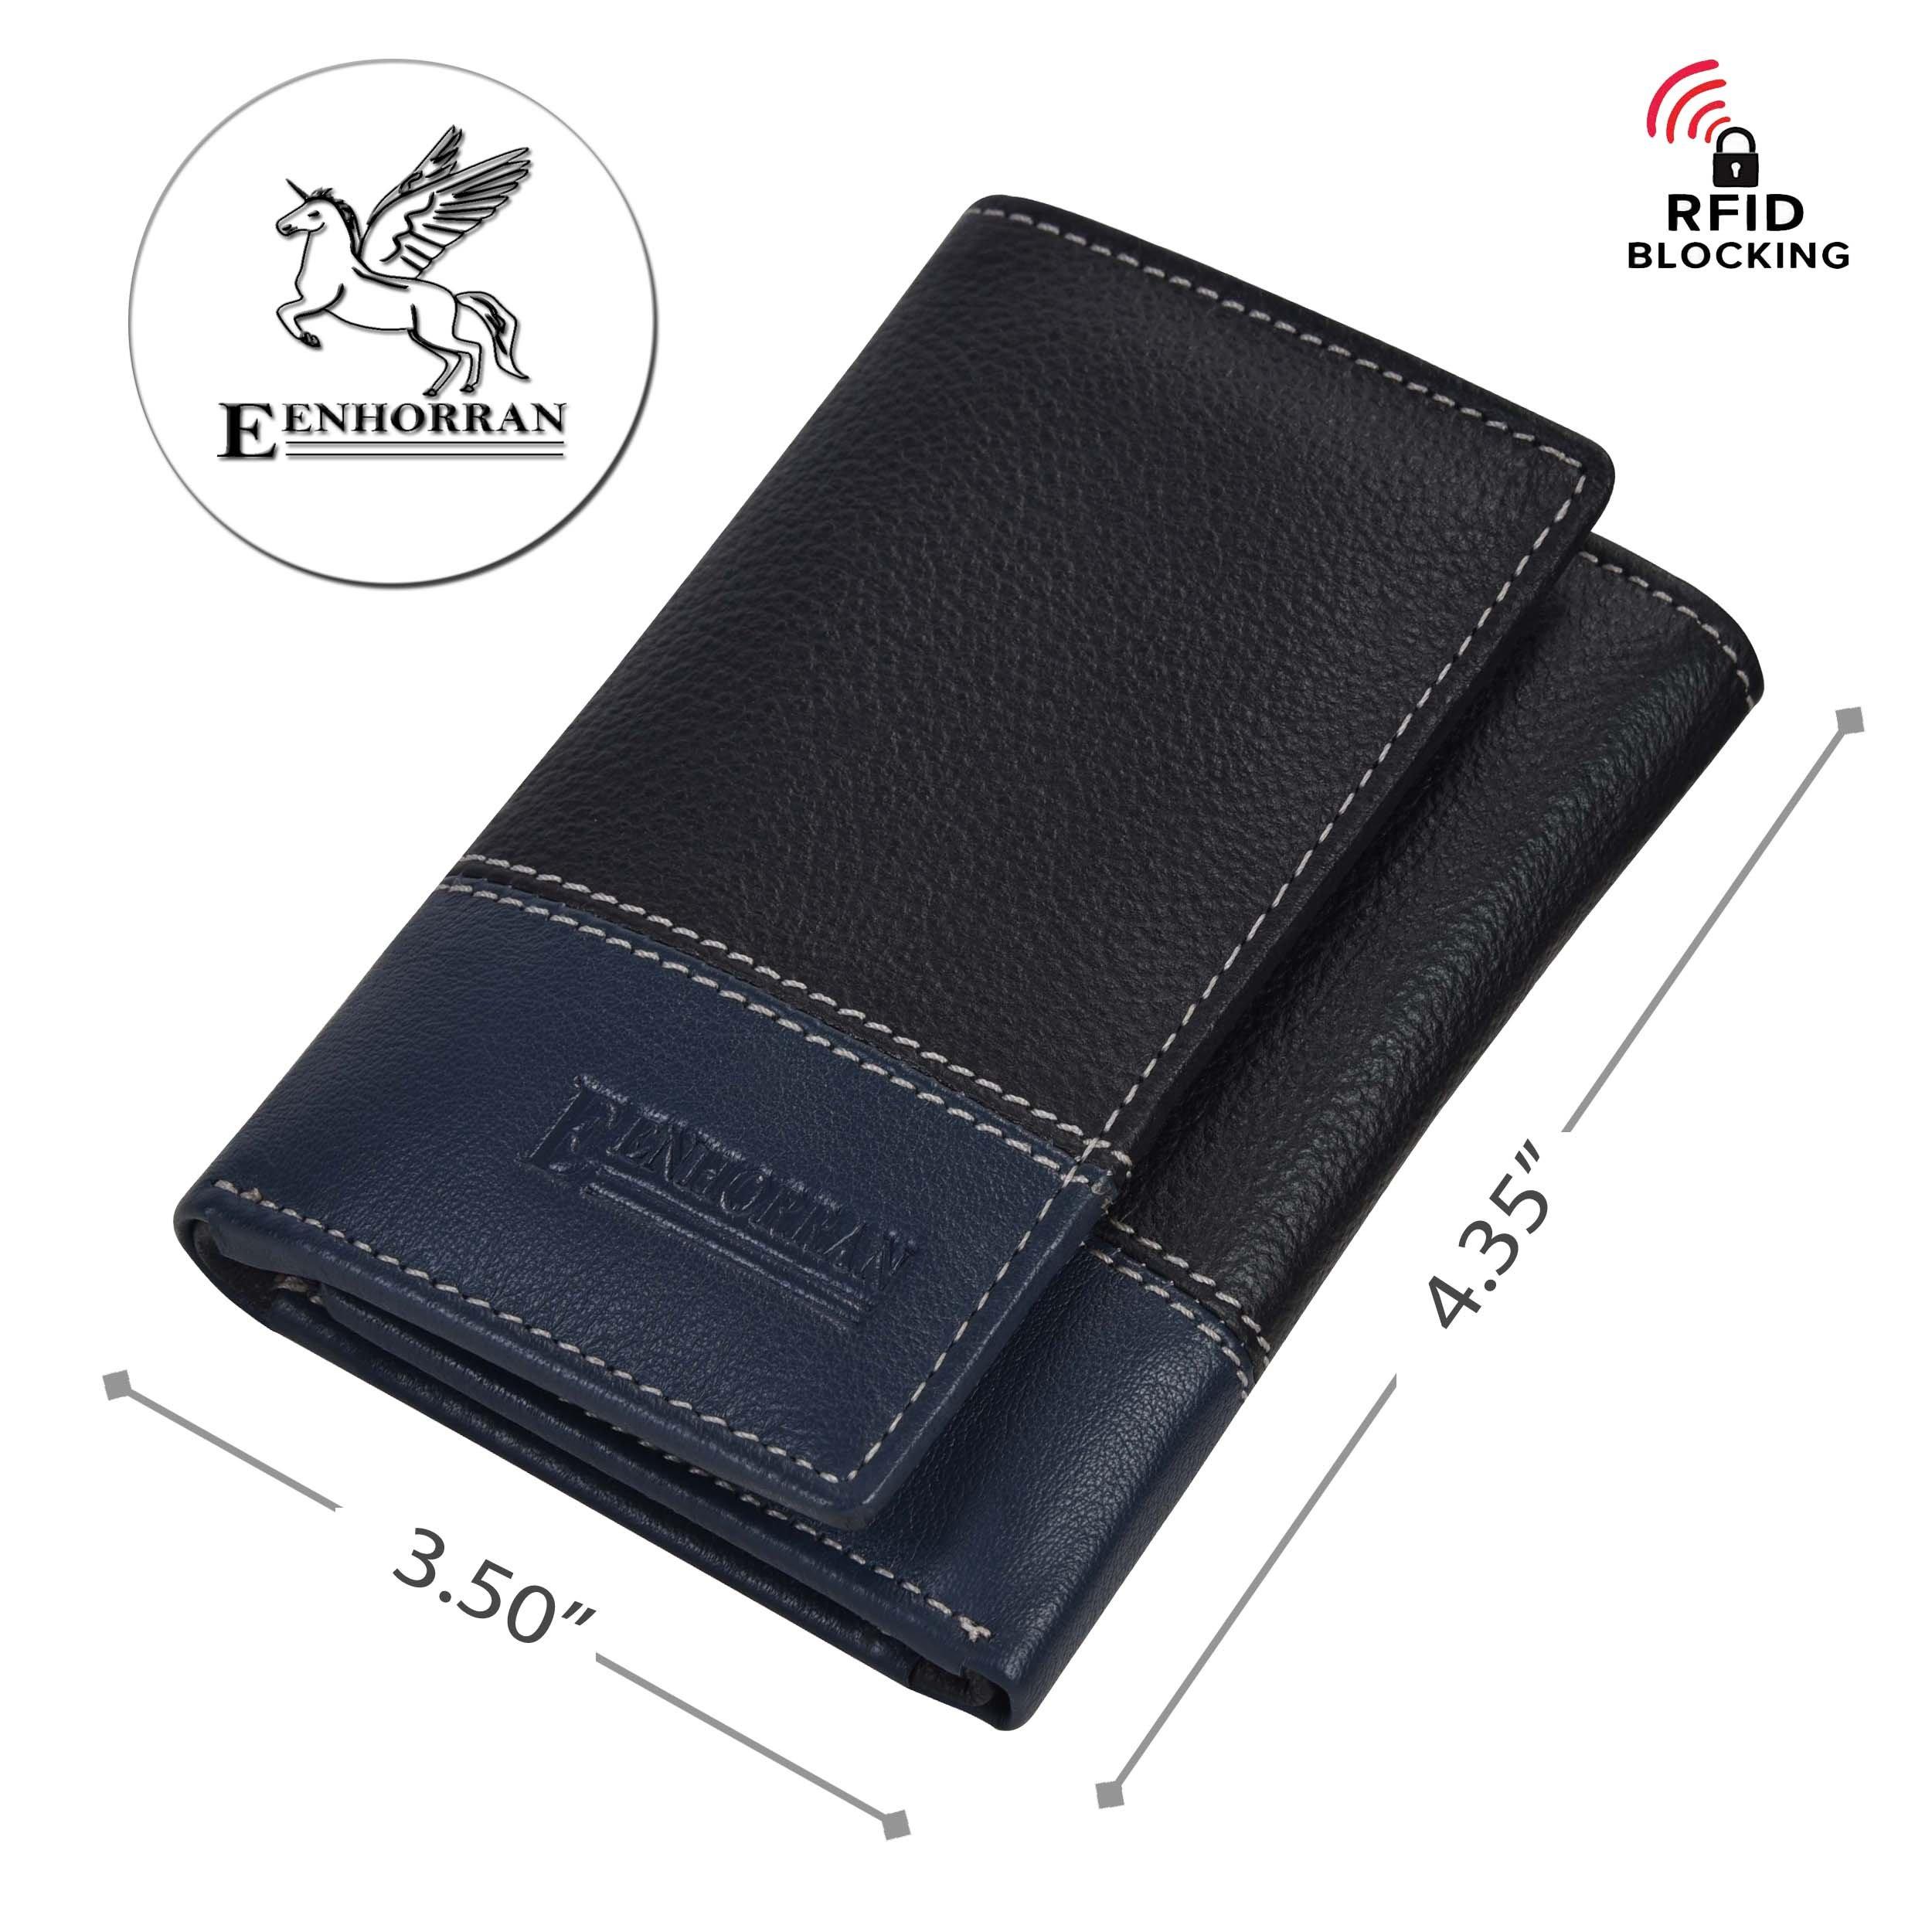 RFID Leather Trifold Wallets for Men - Handmade Slim Mens Wallet 6 Credit Card ID Window and Gift Box Secure by EENHORRAN (Black & Navy) by EENHORRAN (Image #4)